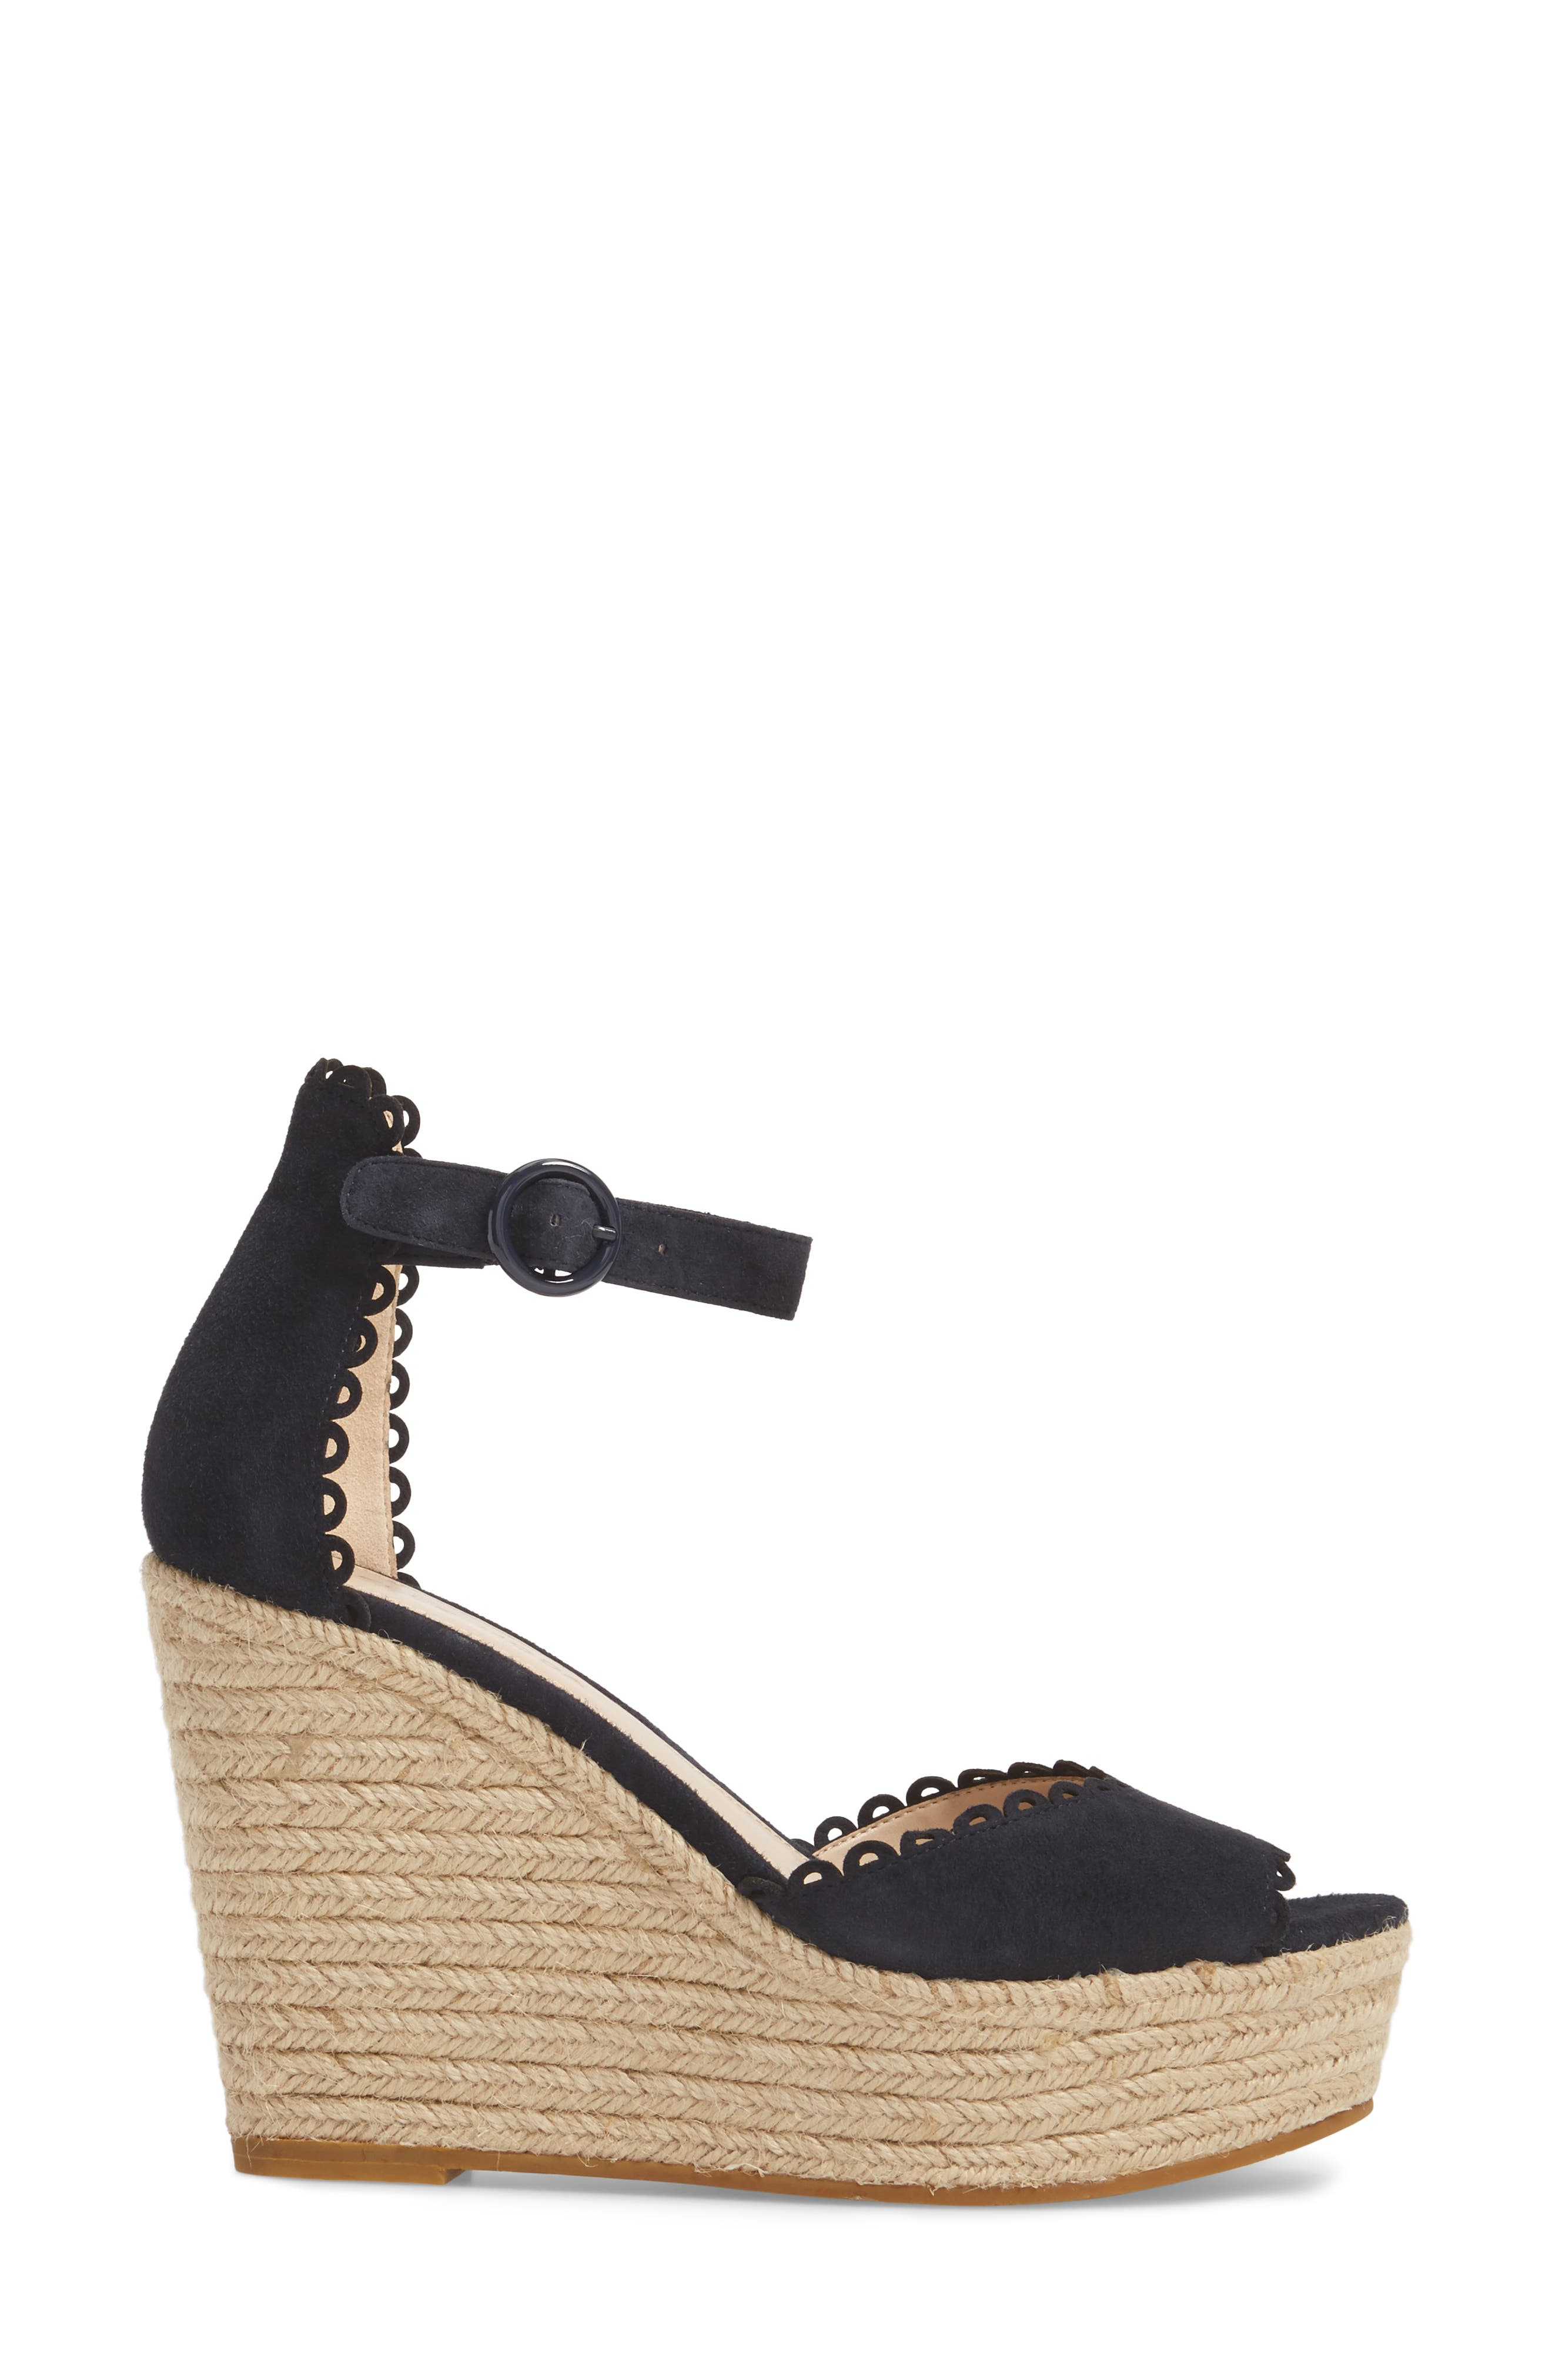 Alternate Image 3  - Pelle Moda Raine Platform Espadrille Sandal (Women)